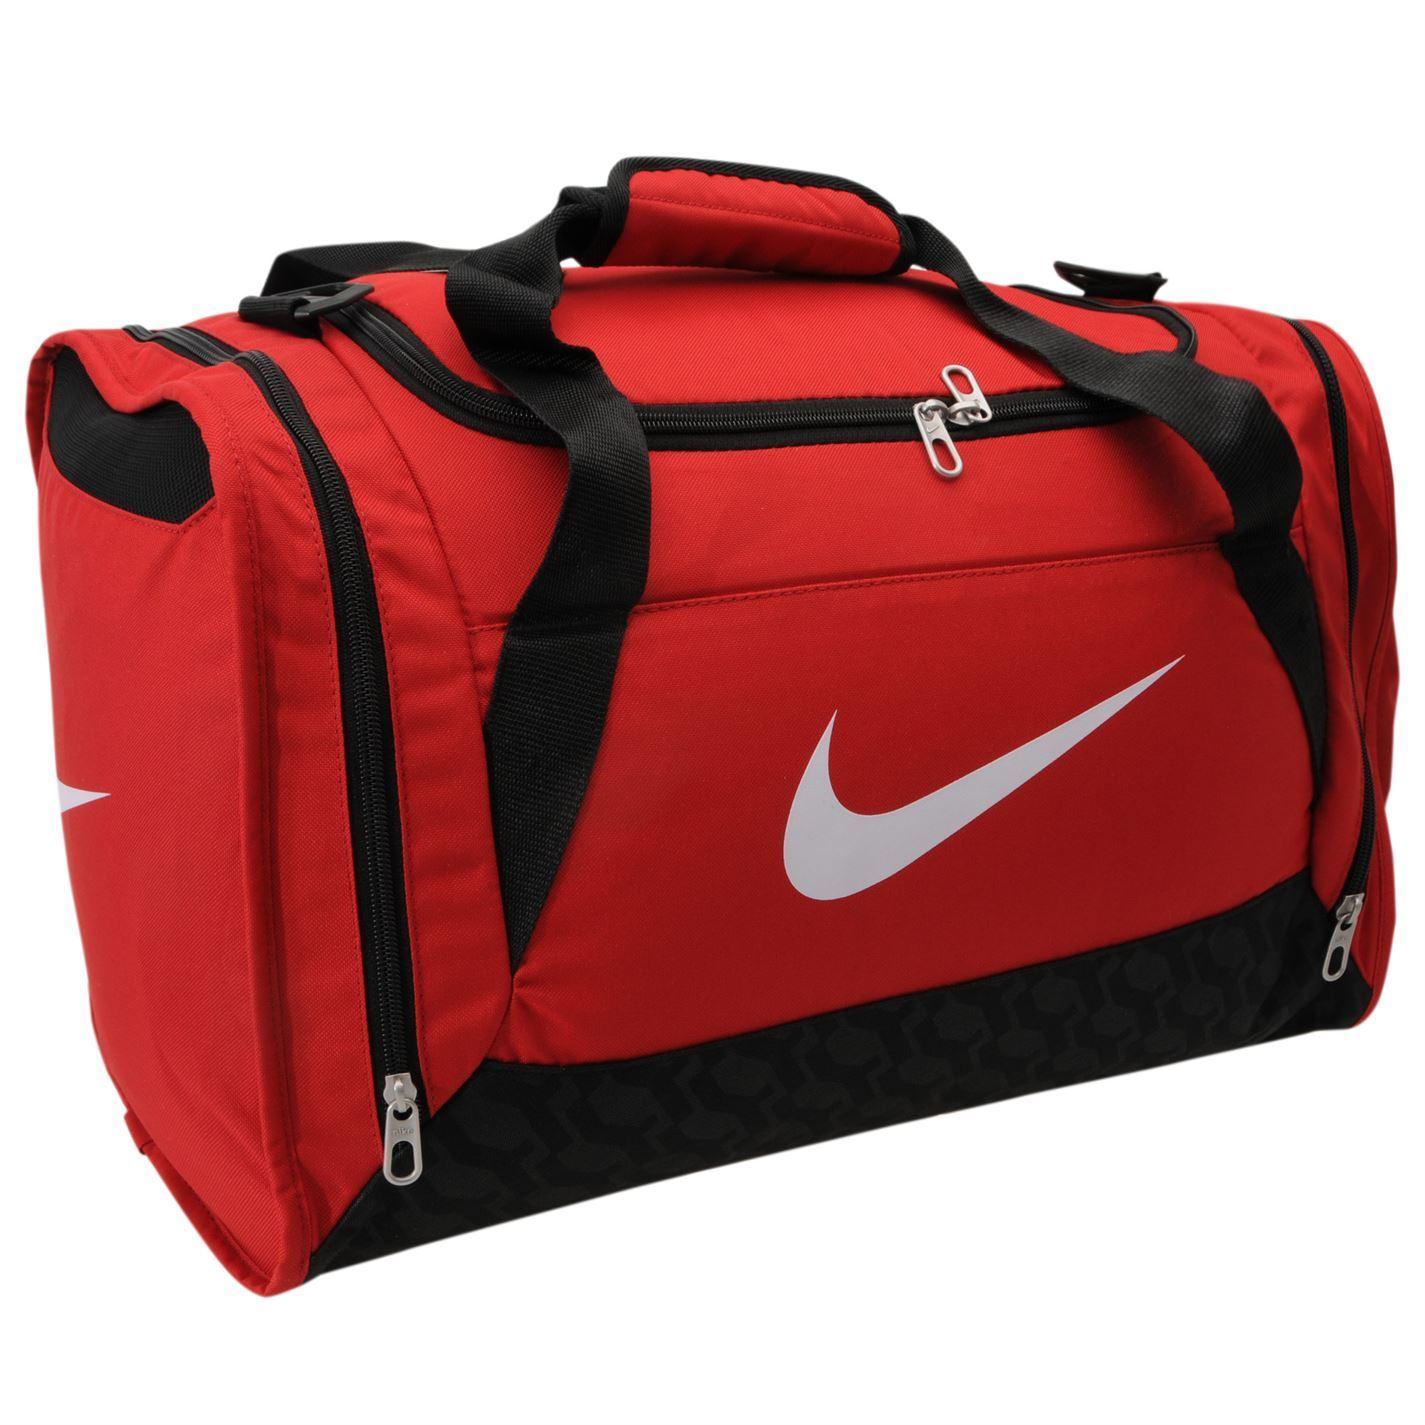 ... Nike Brasilia Small Grip Bag Red Gym Sports Bag Genuine ... 52948fe7d2140